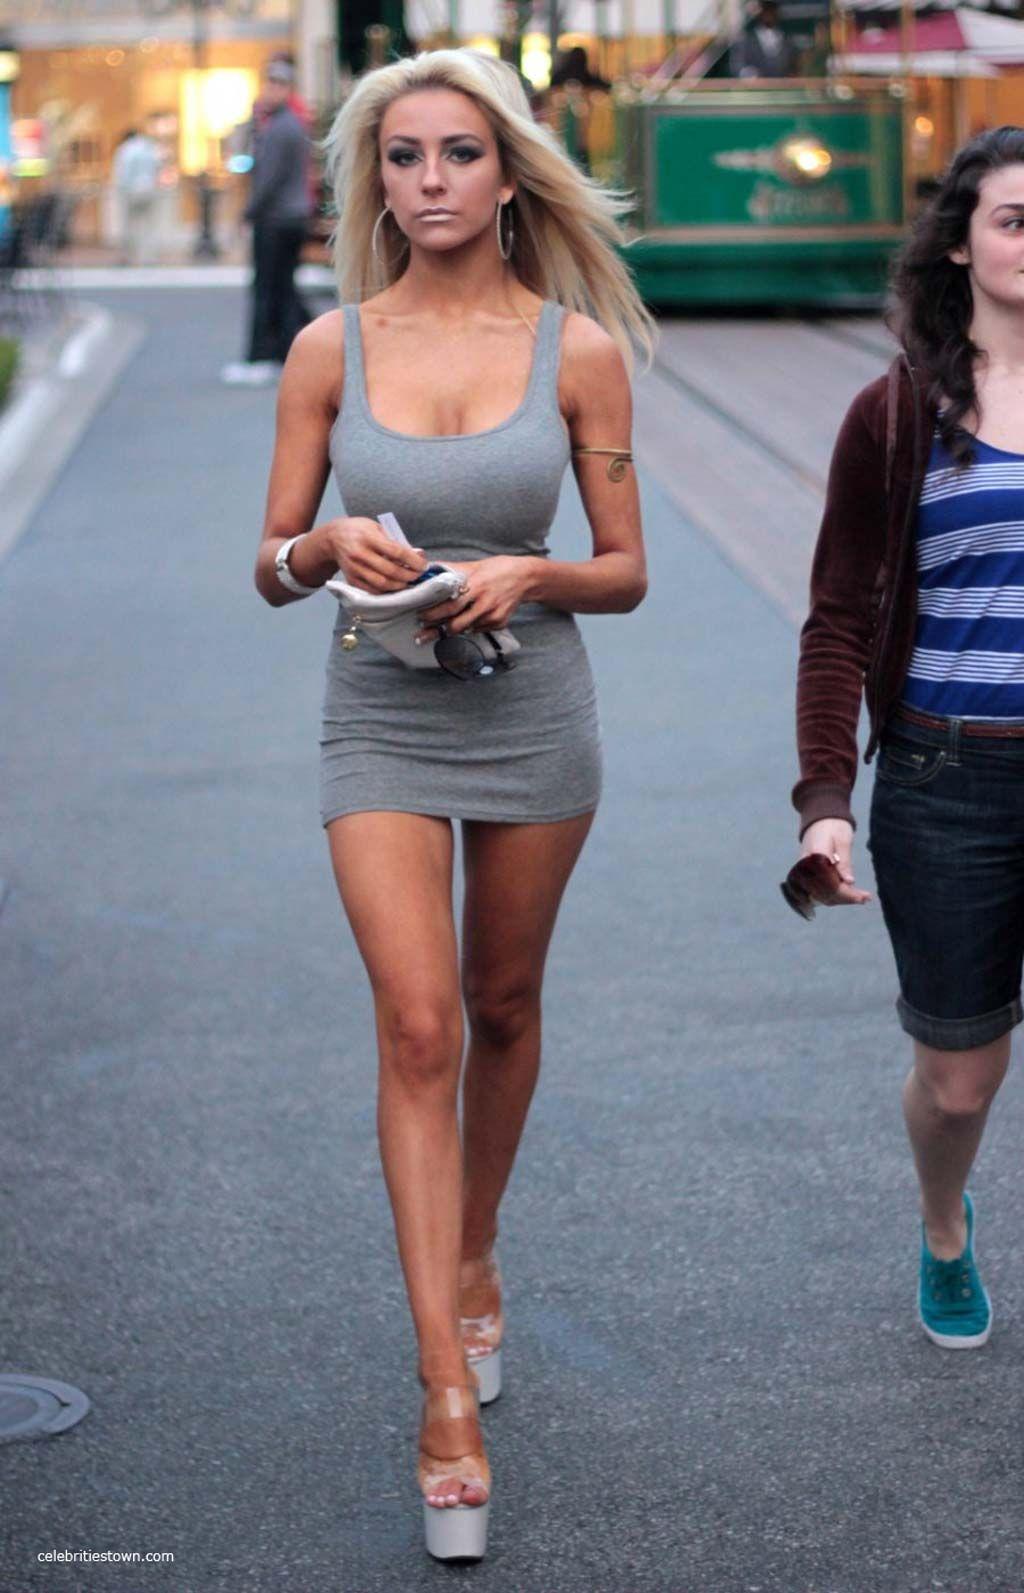 mini skirts - Google Search | Ladies on the street | Pinterest ...